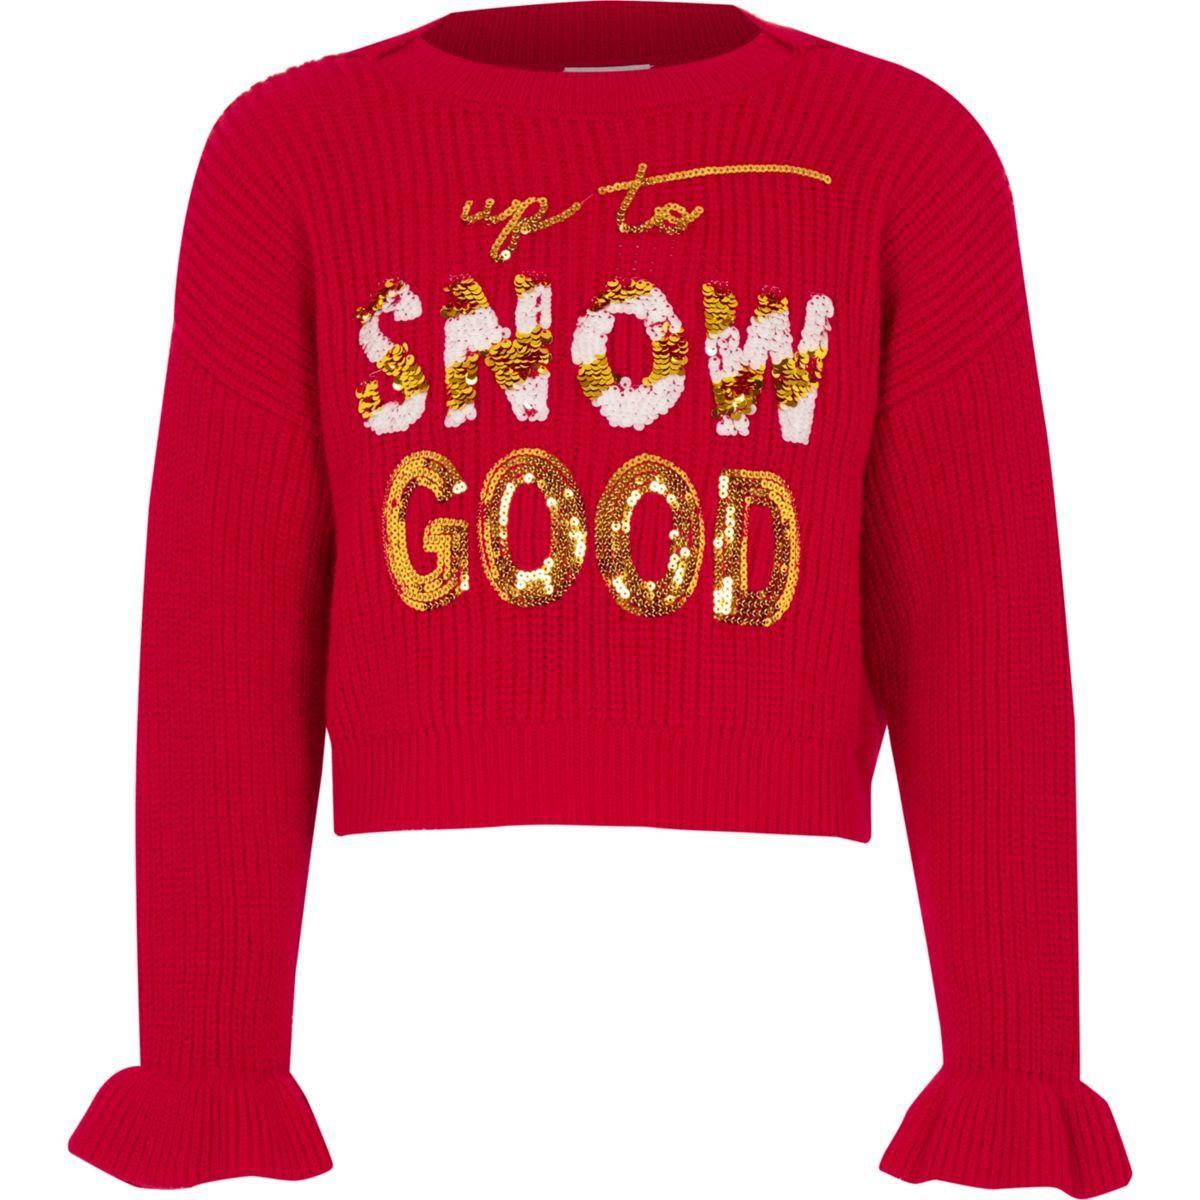 74ea432e4c5 Girls red 'Snow good' Christmas jumper   Lola's Christmas Clothing ...